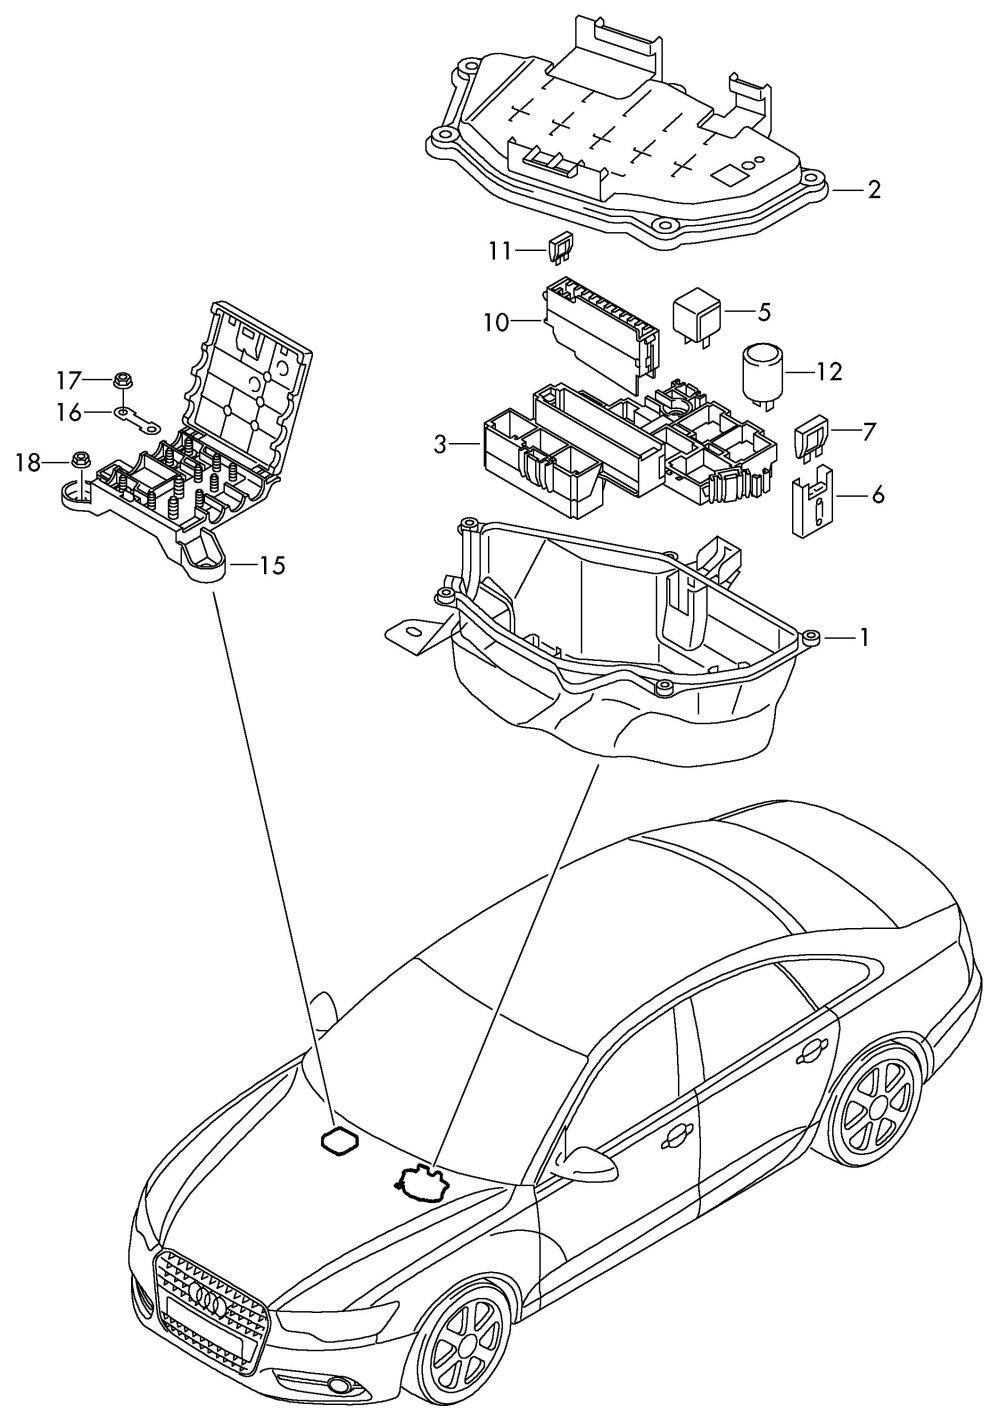 medium resolution of audi r8 fuse box wiring diagrams audi q5 audi r8 fuse box